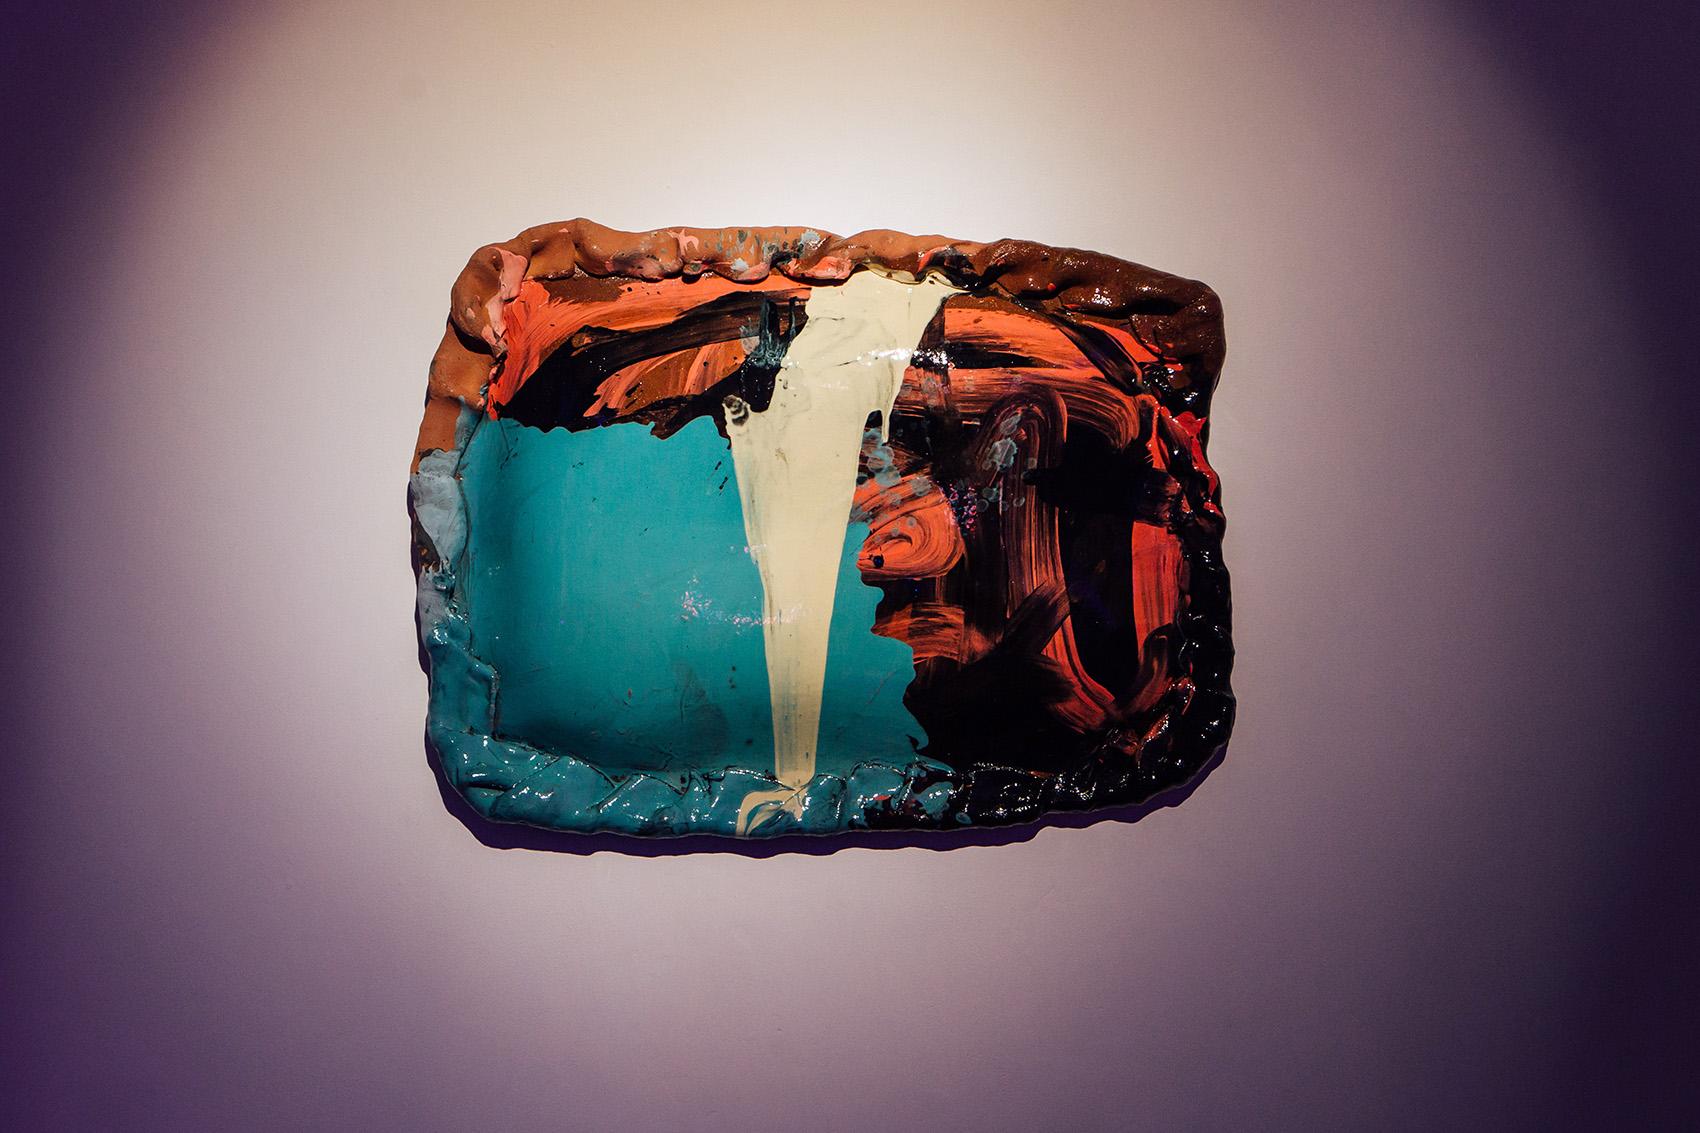 Untitled (XL action pasty) , 2018, slab-built terracotta, slips, transparent glaze, assistance from Ben Kew